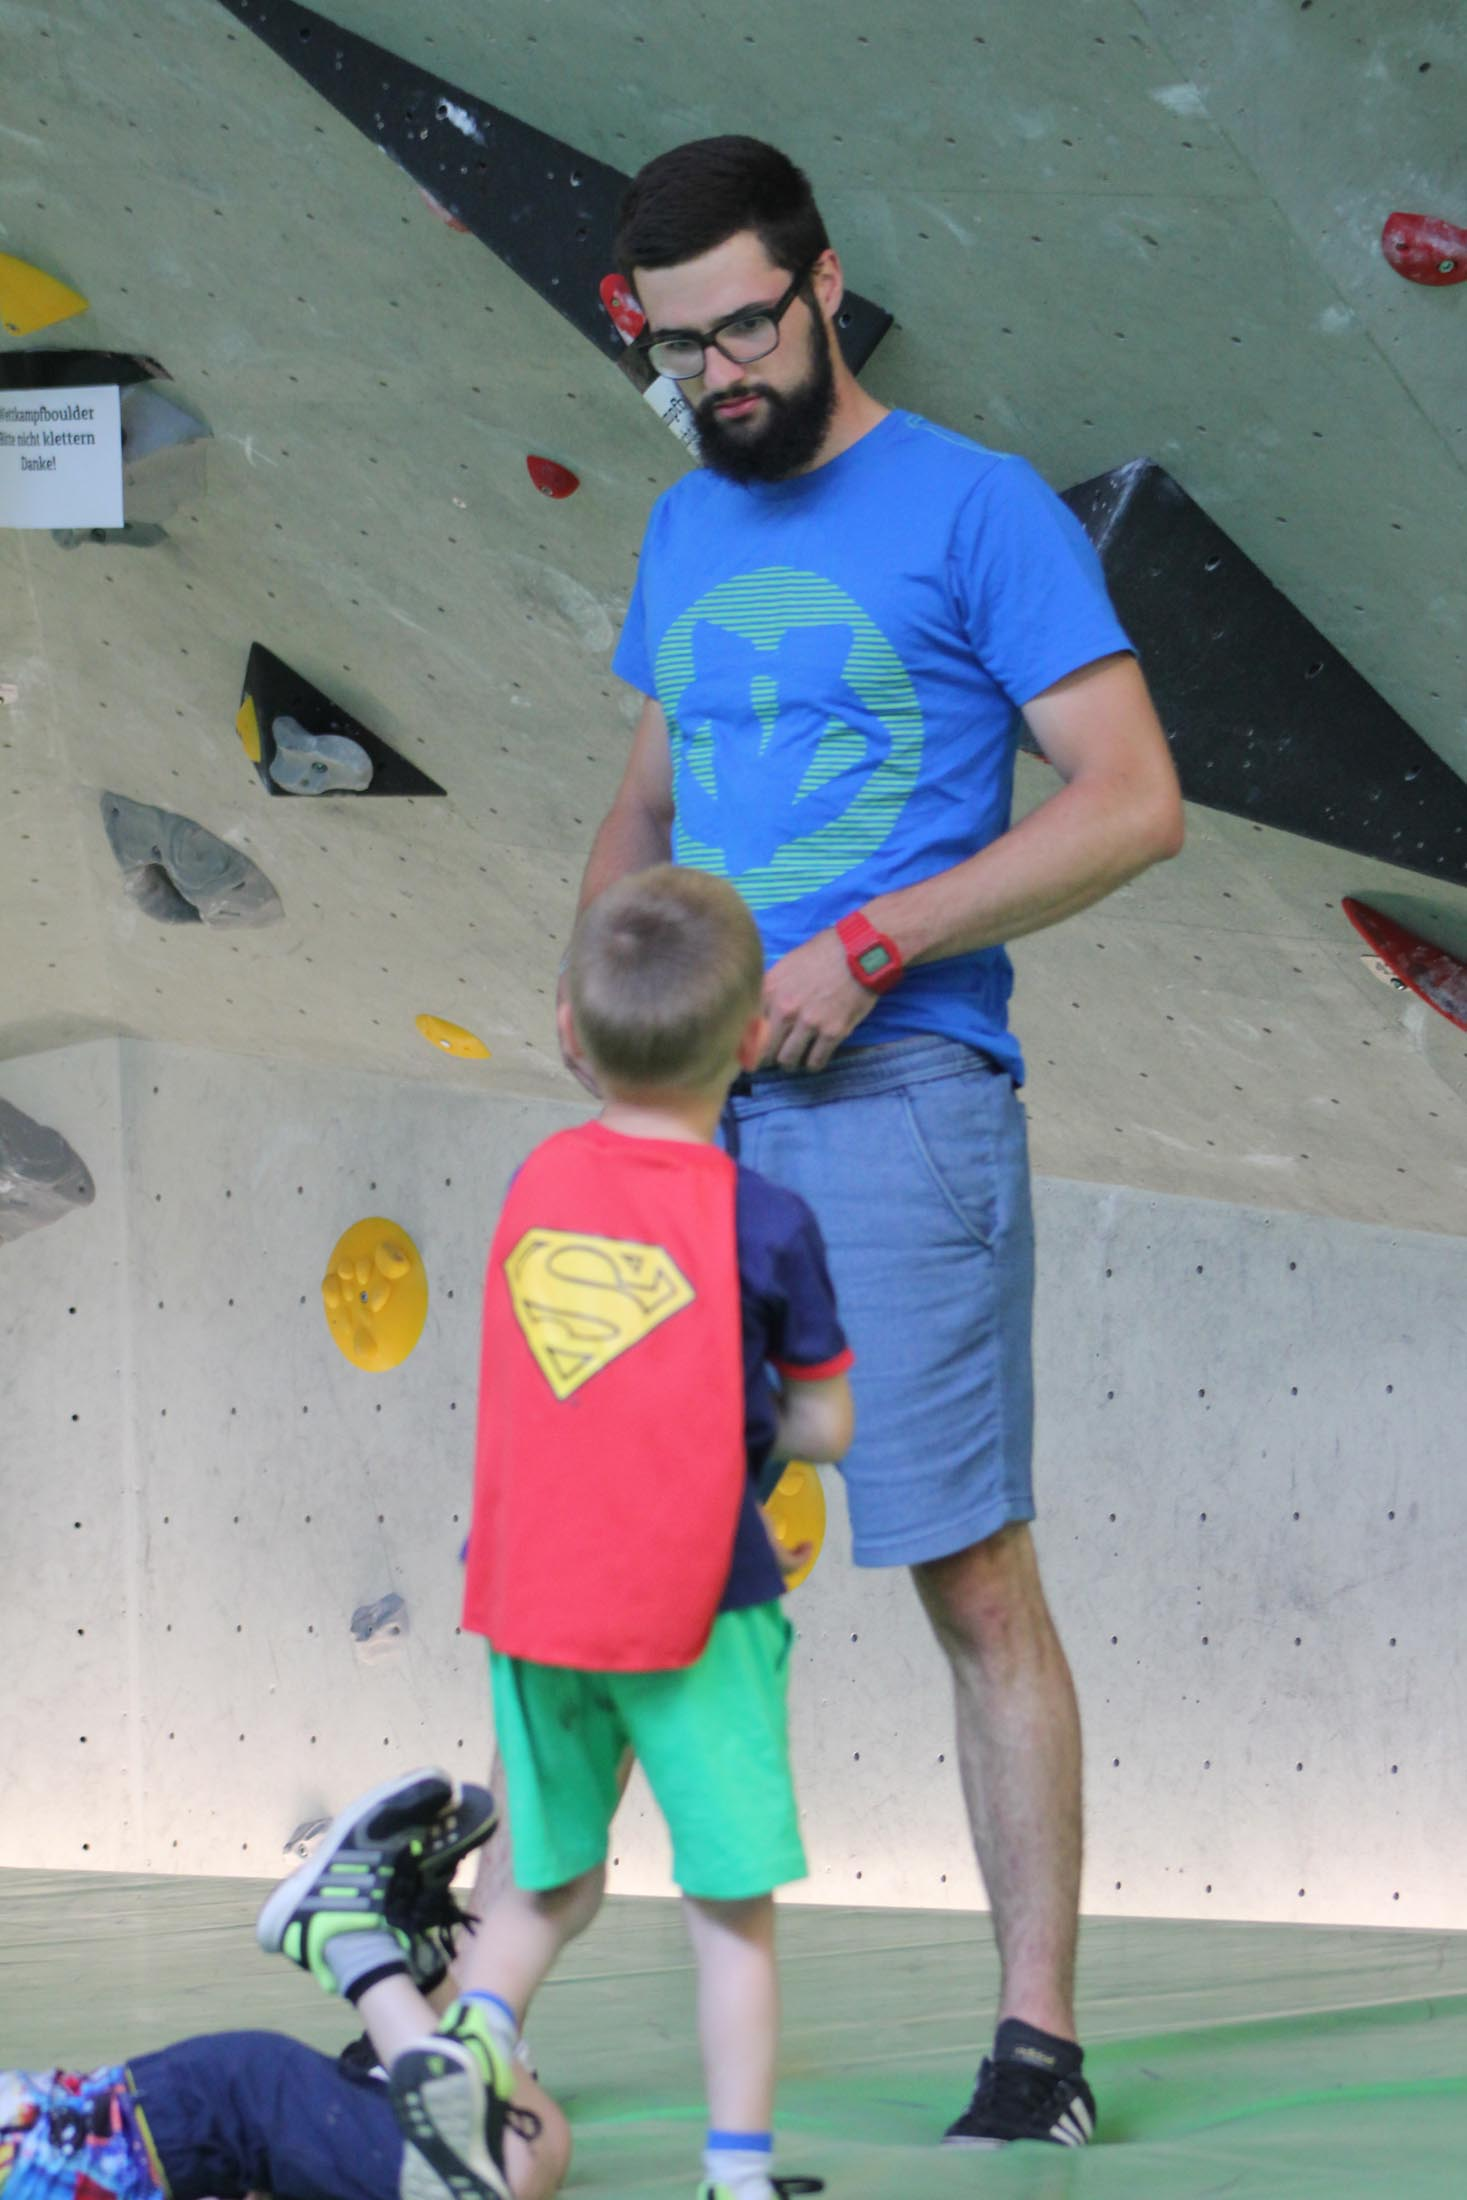 Registration internationaler bouldercup Frankenjura 2016, BLOCKHELDEN Erlangen, Mammut, Bergfreunde.de, Boulderwettkampf07092016079